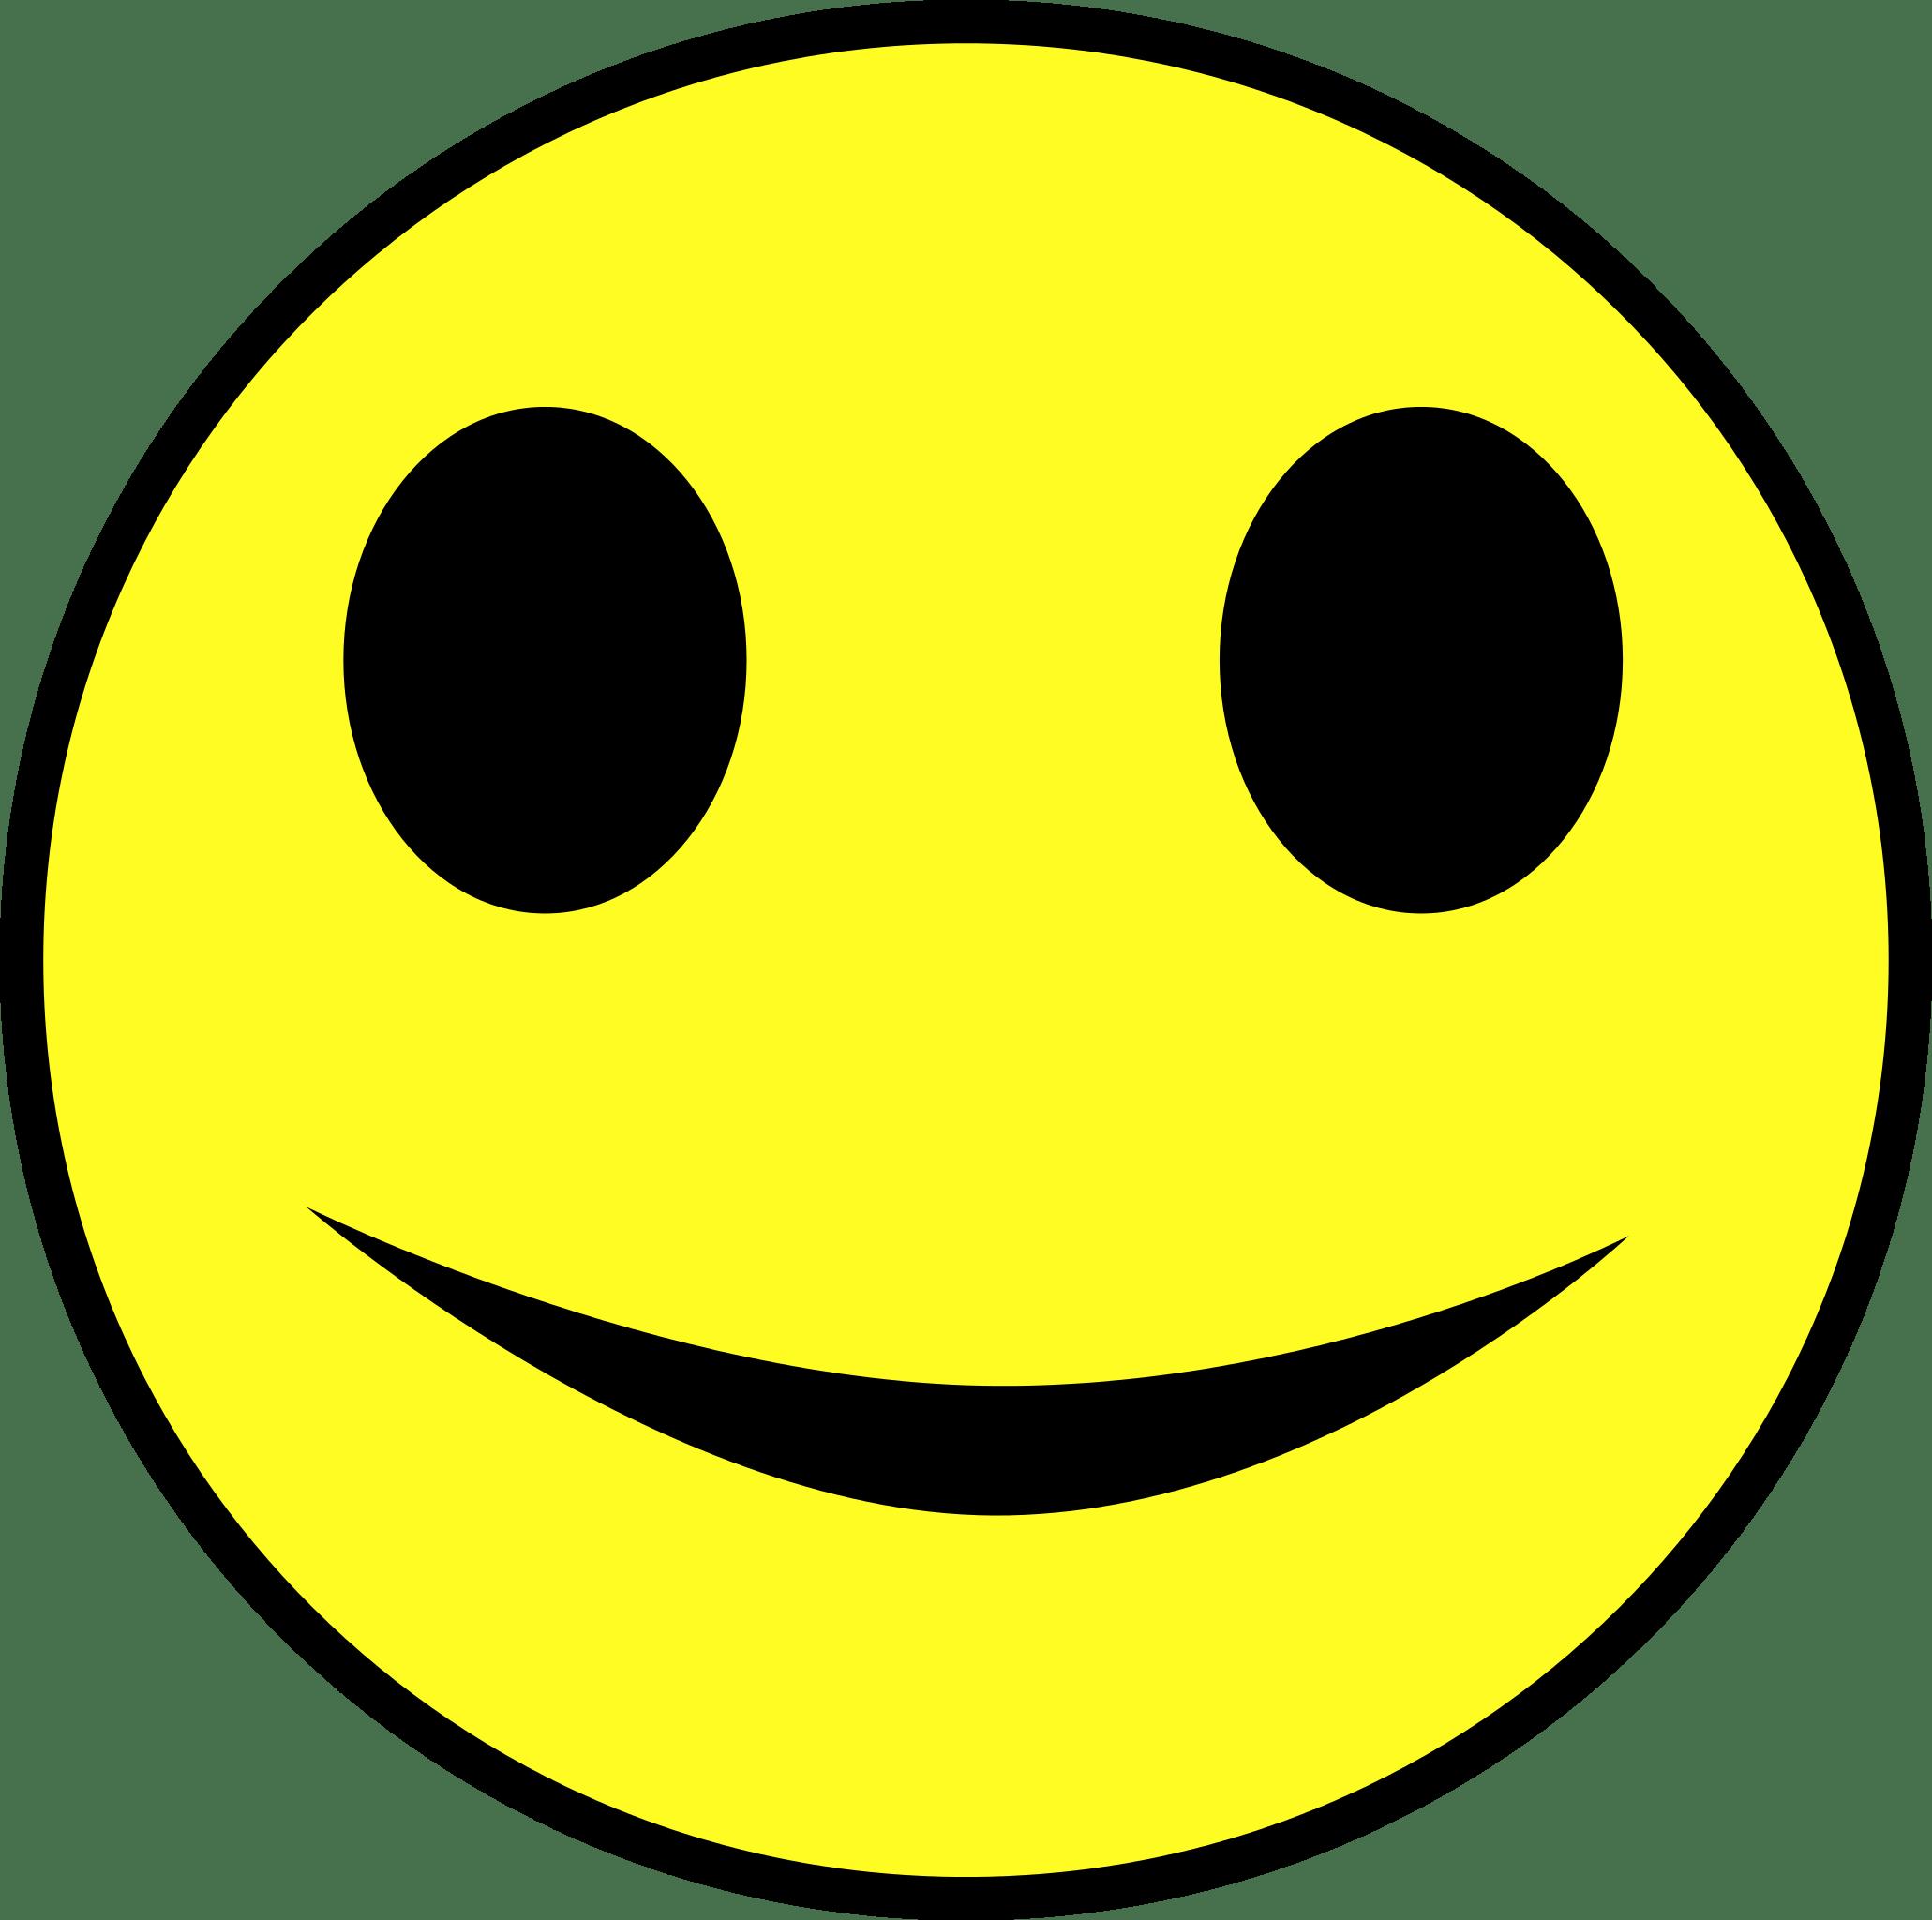 Happy Face Printable